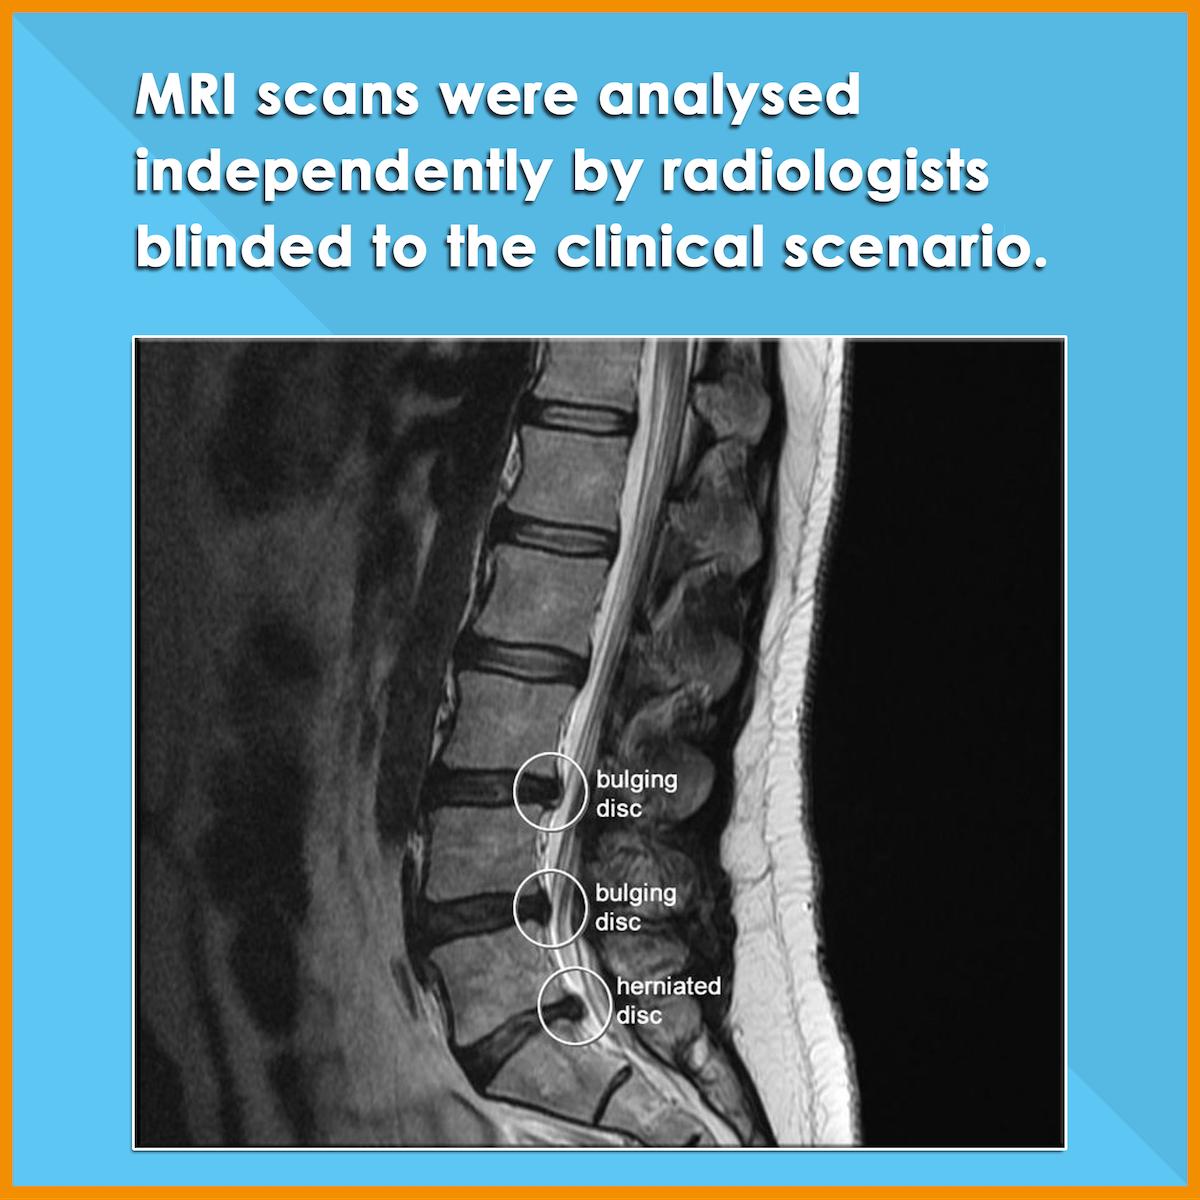 Incidence of Abnormal MRI